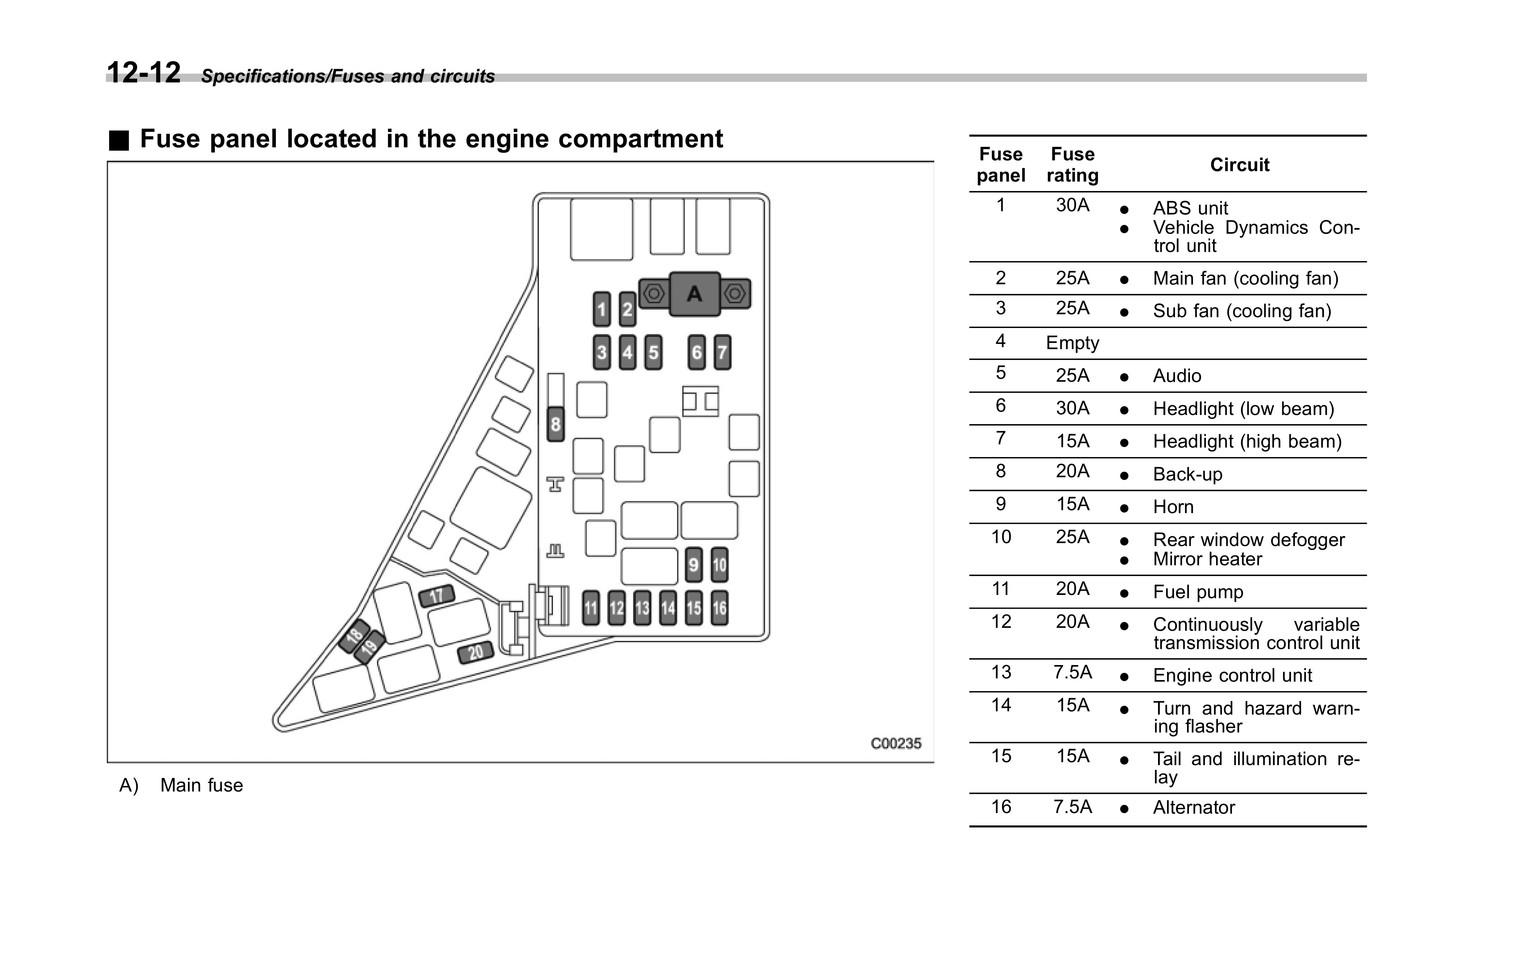 92 Subaru Legacy Fuse Box - Wiring Diagrams DataUssel